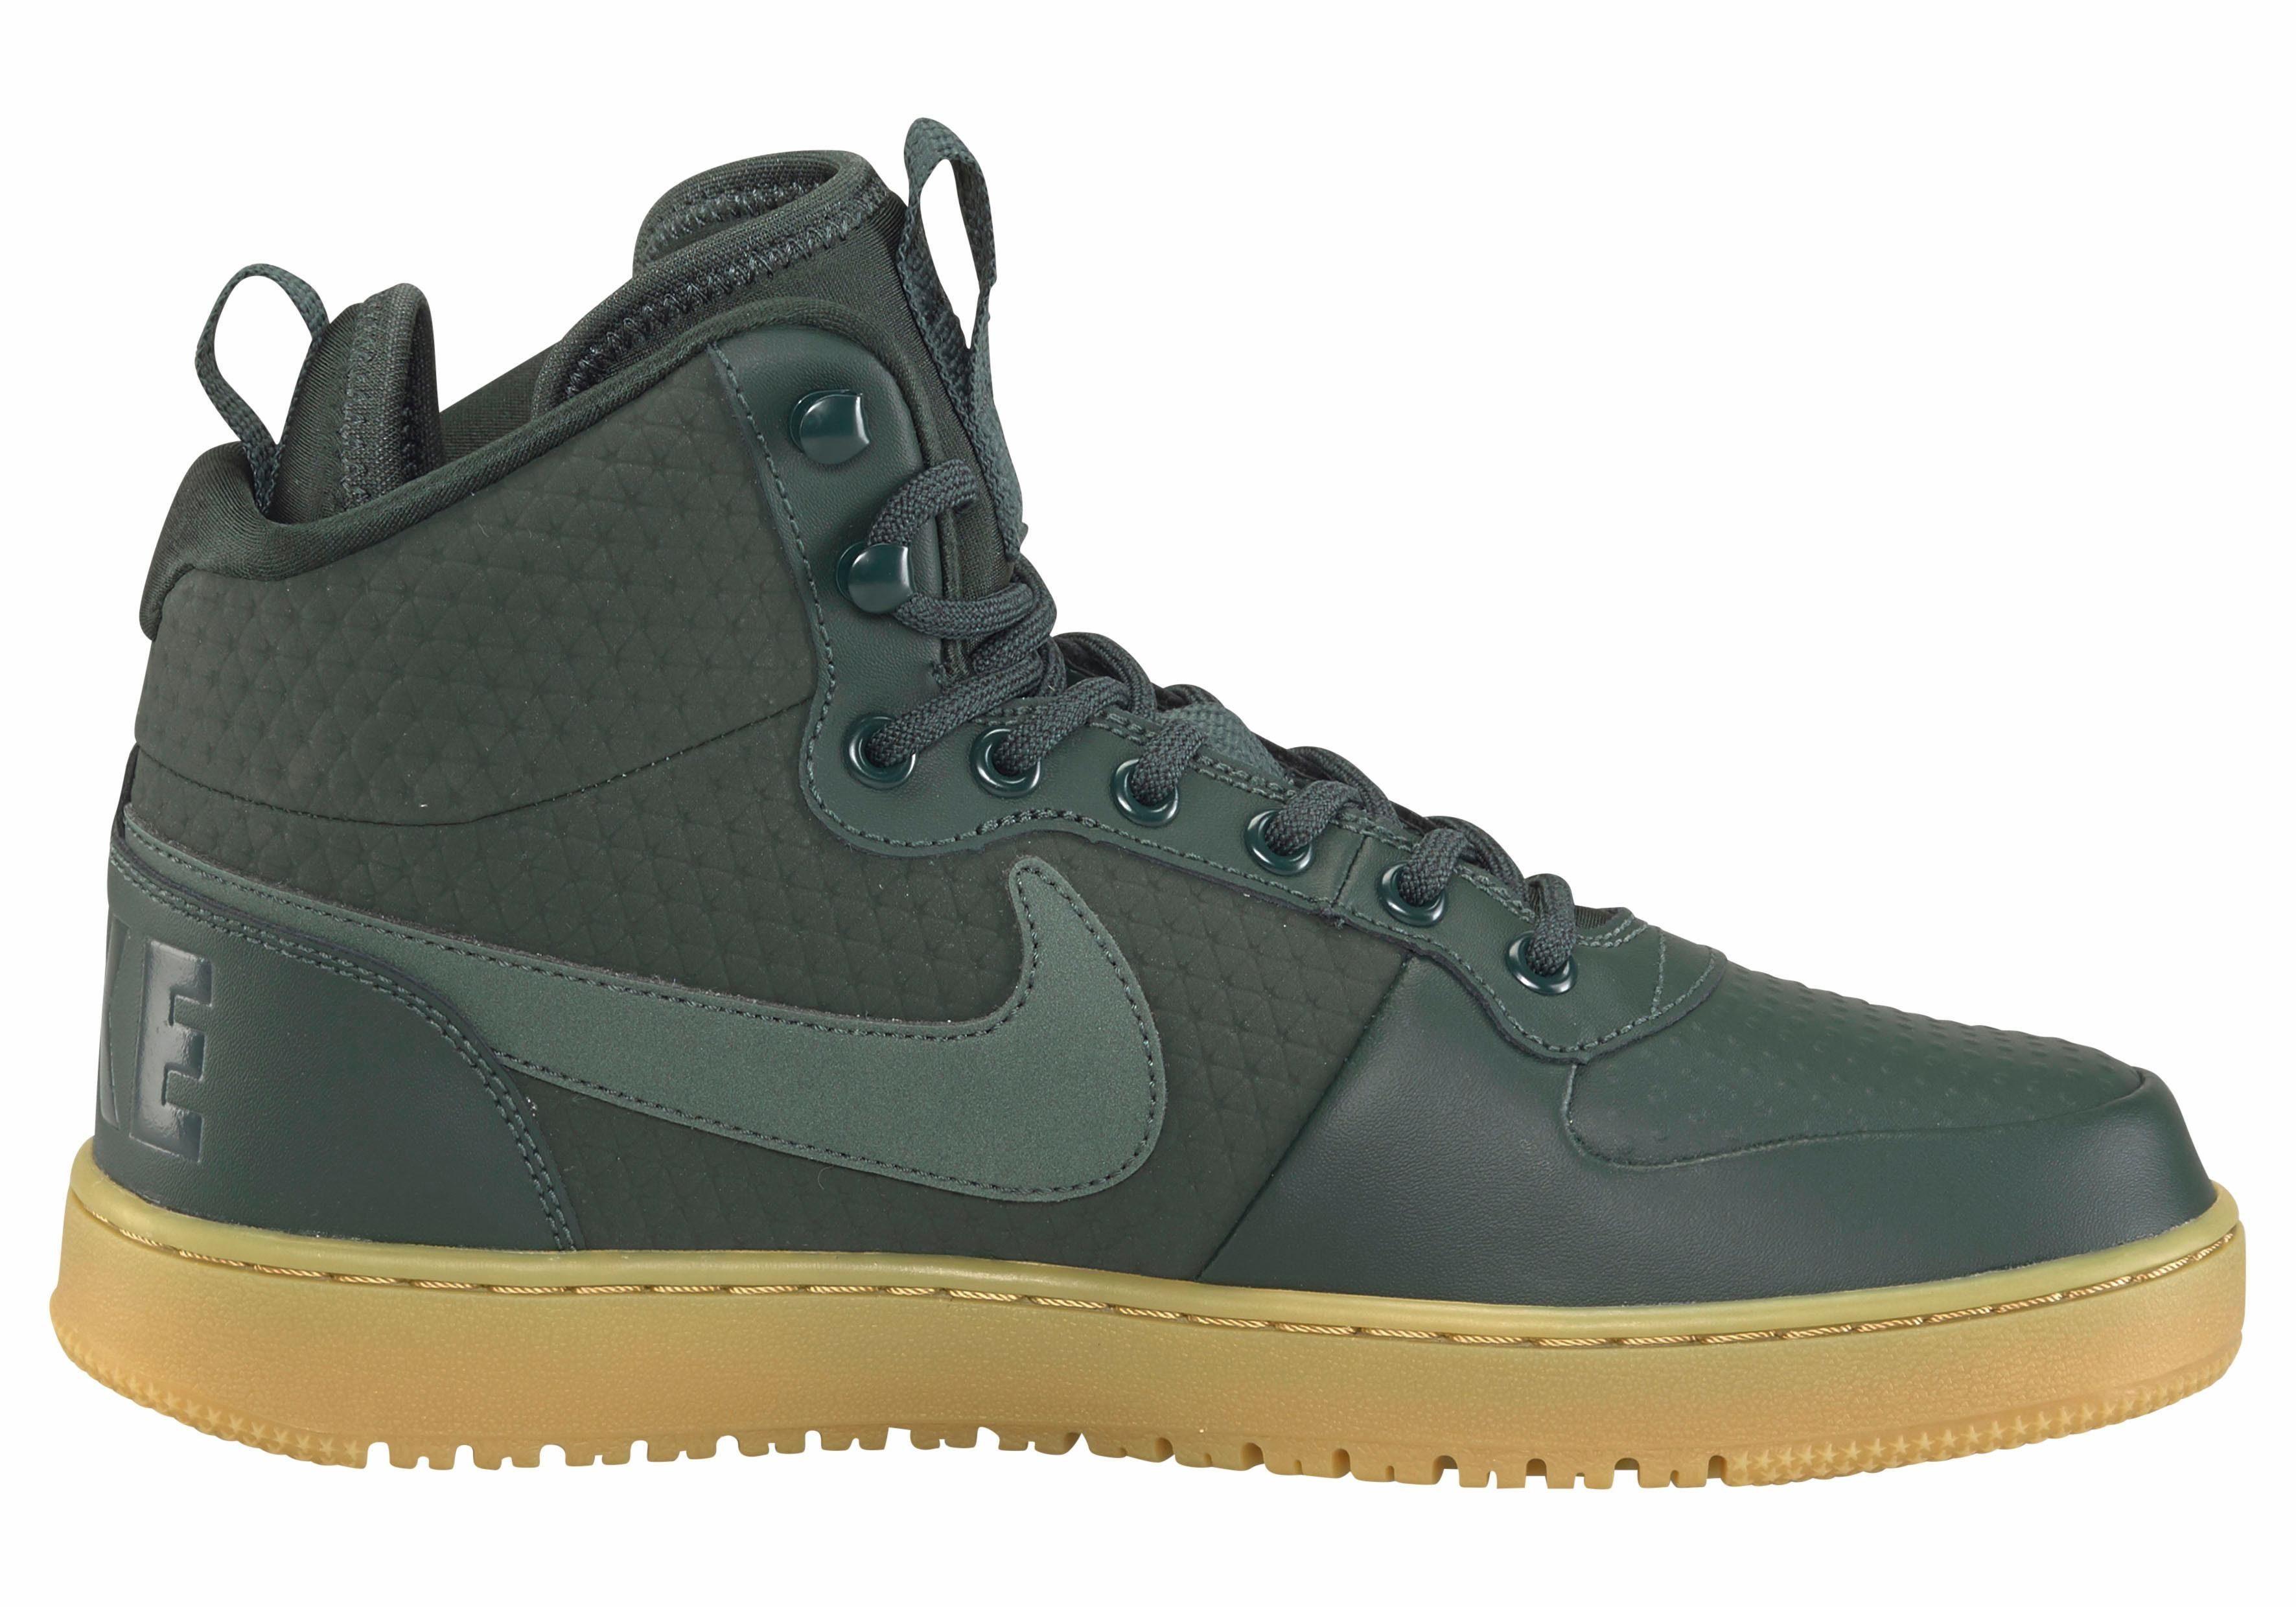 Nike Sportswear Court Borough Mid dunkelgrün Winter Sneaker  dunkelgrün Mid 659808